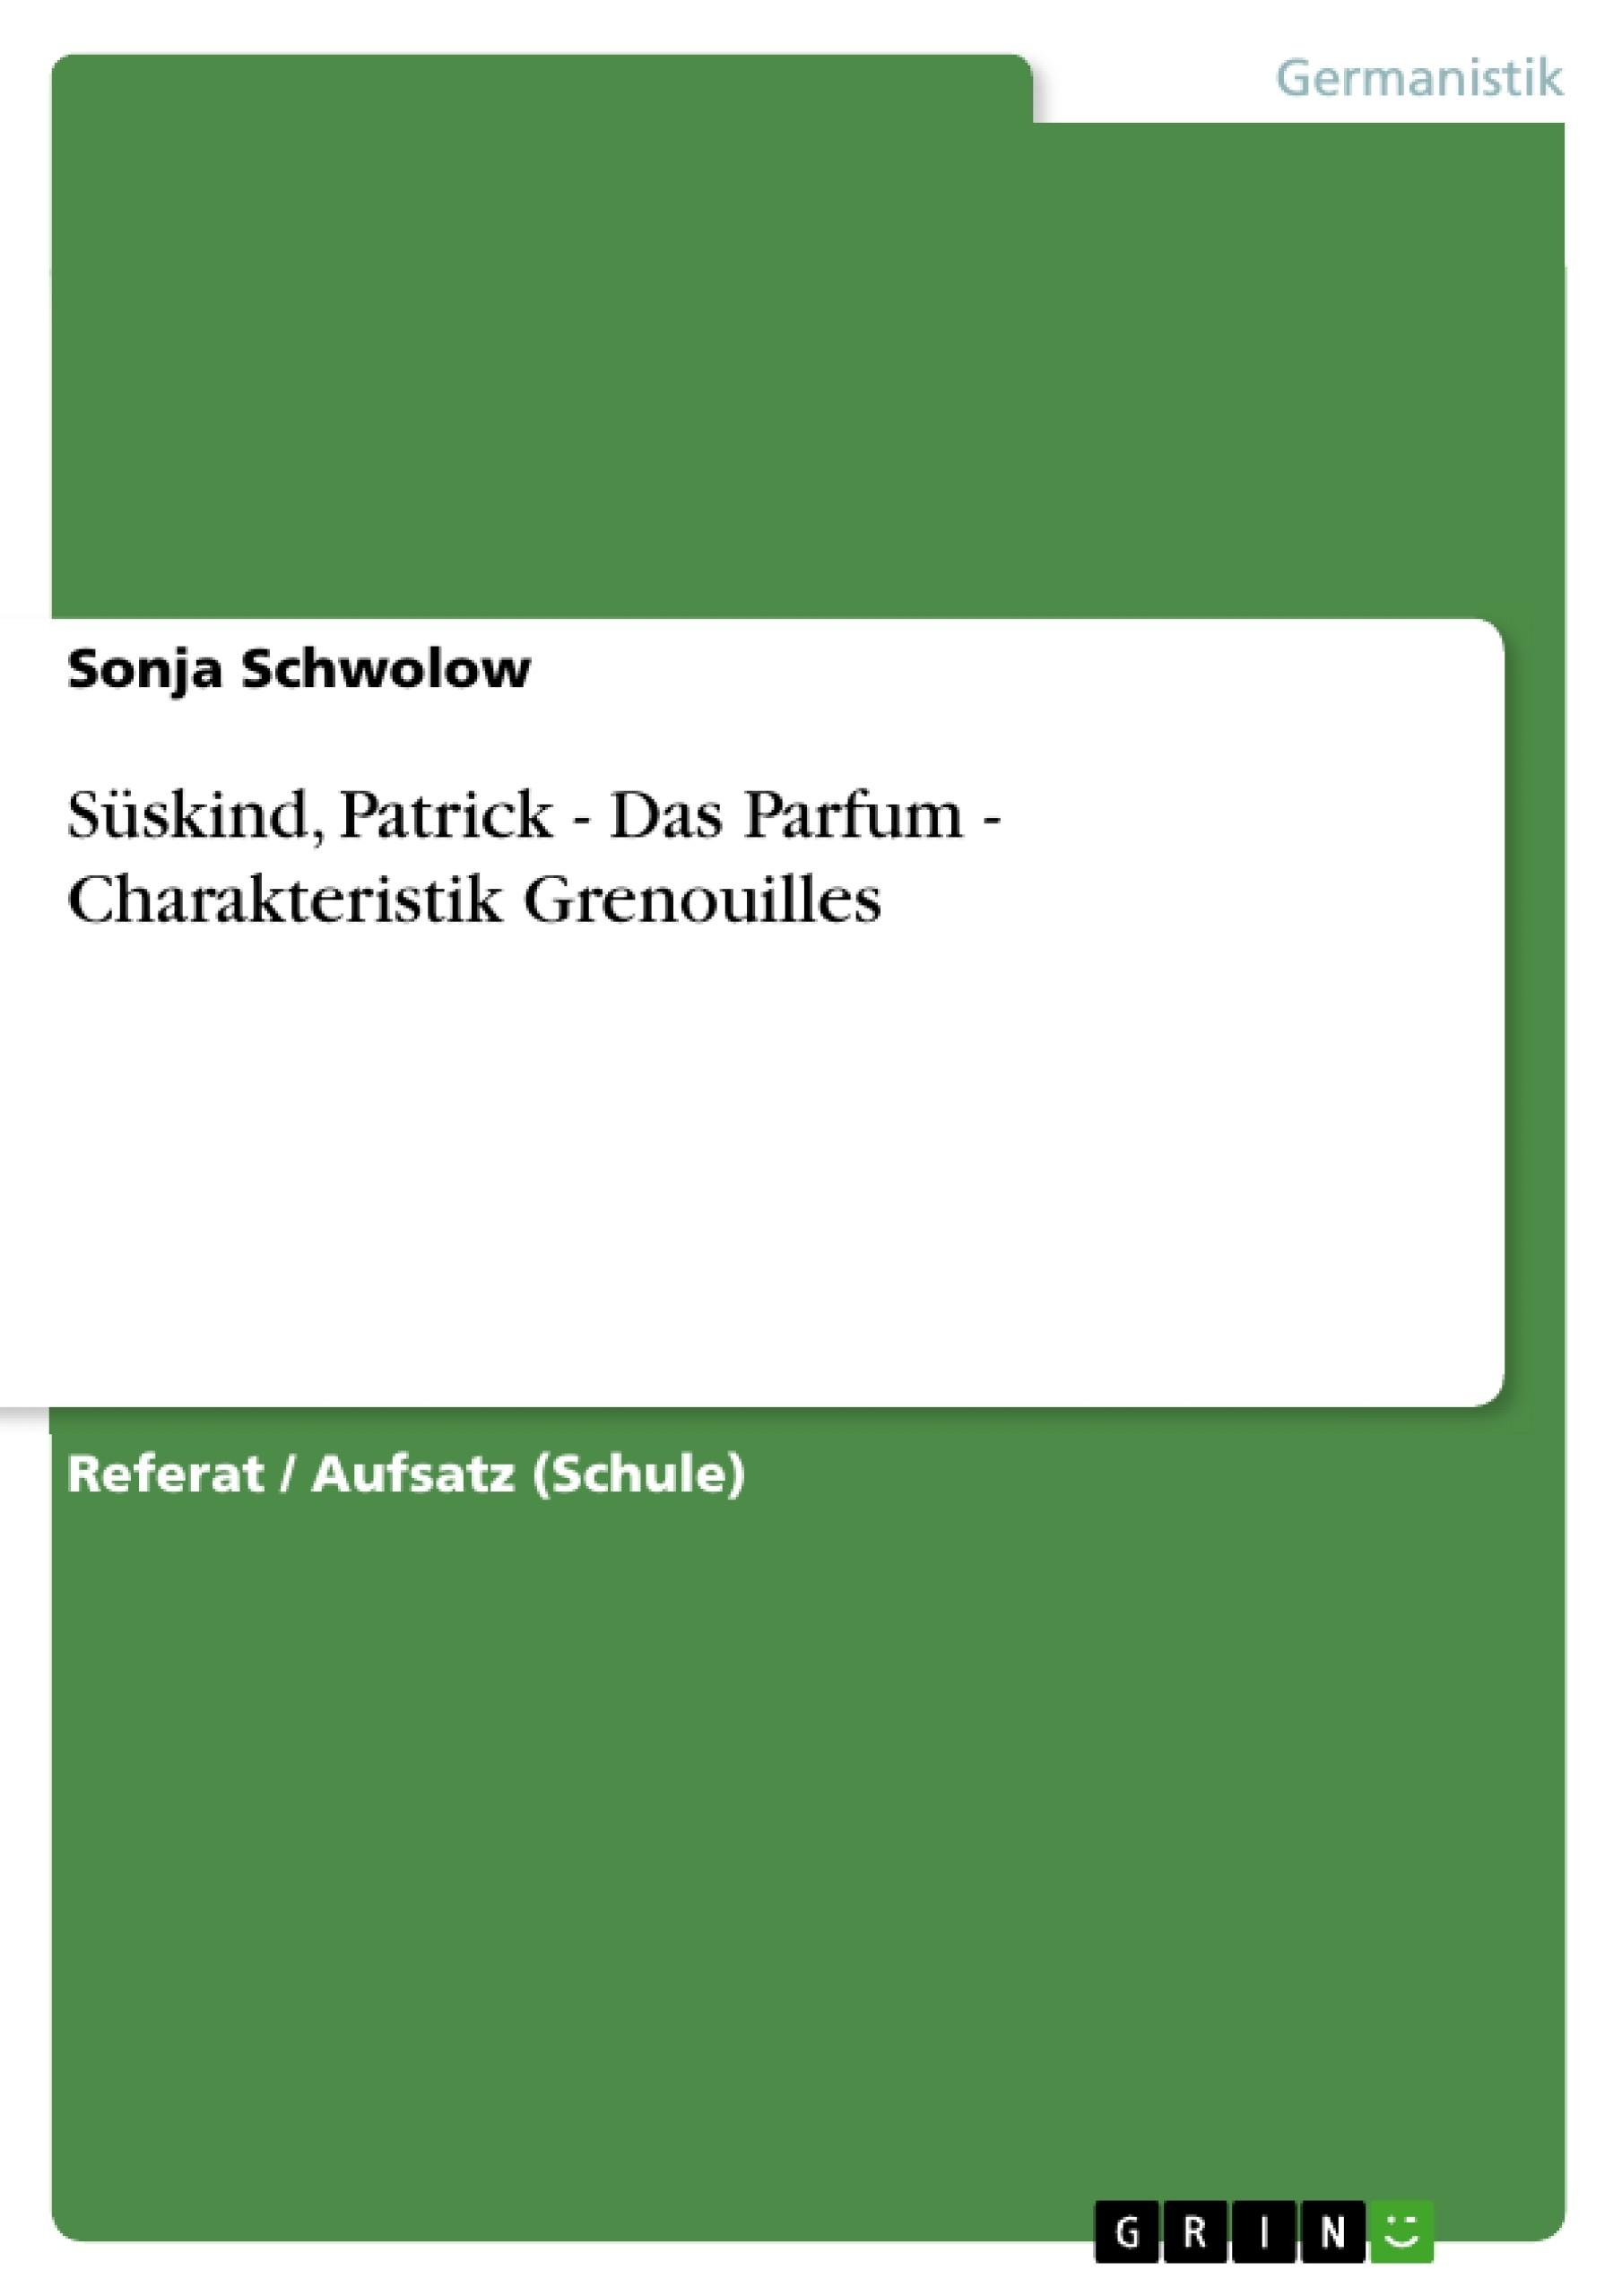 Titel: Süskind, Patrick - Das Parfum - Charakteristik Grenouilles